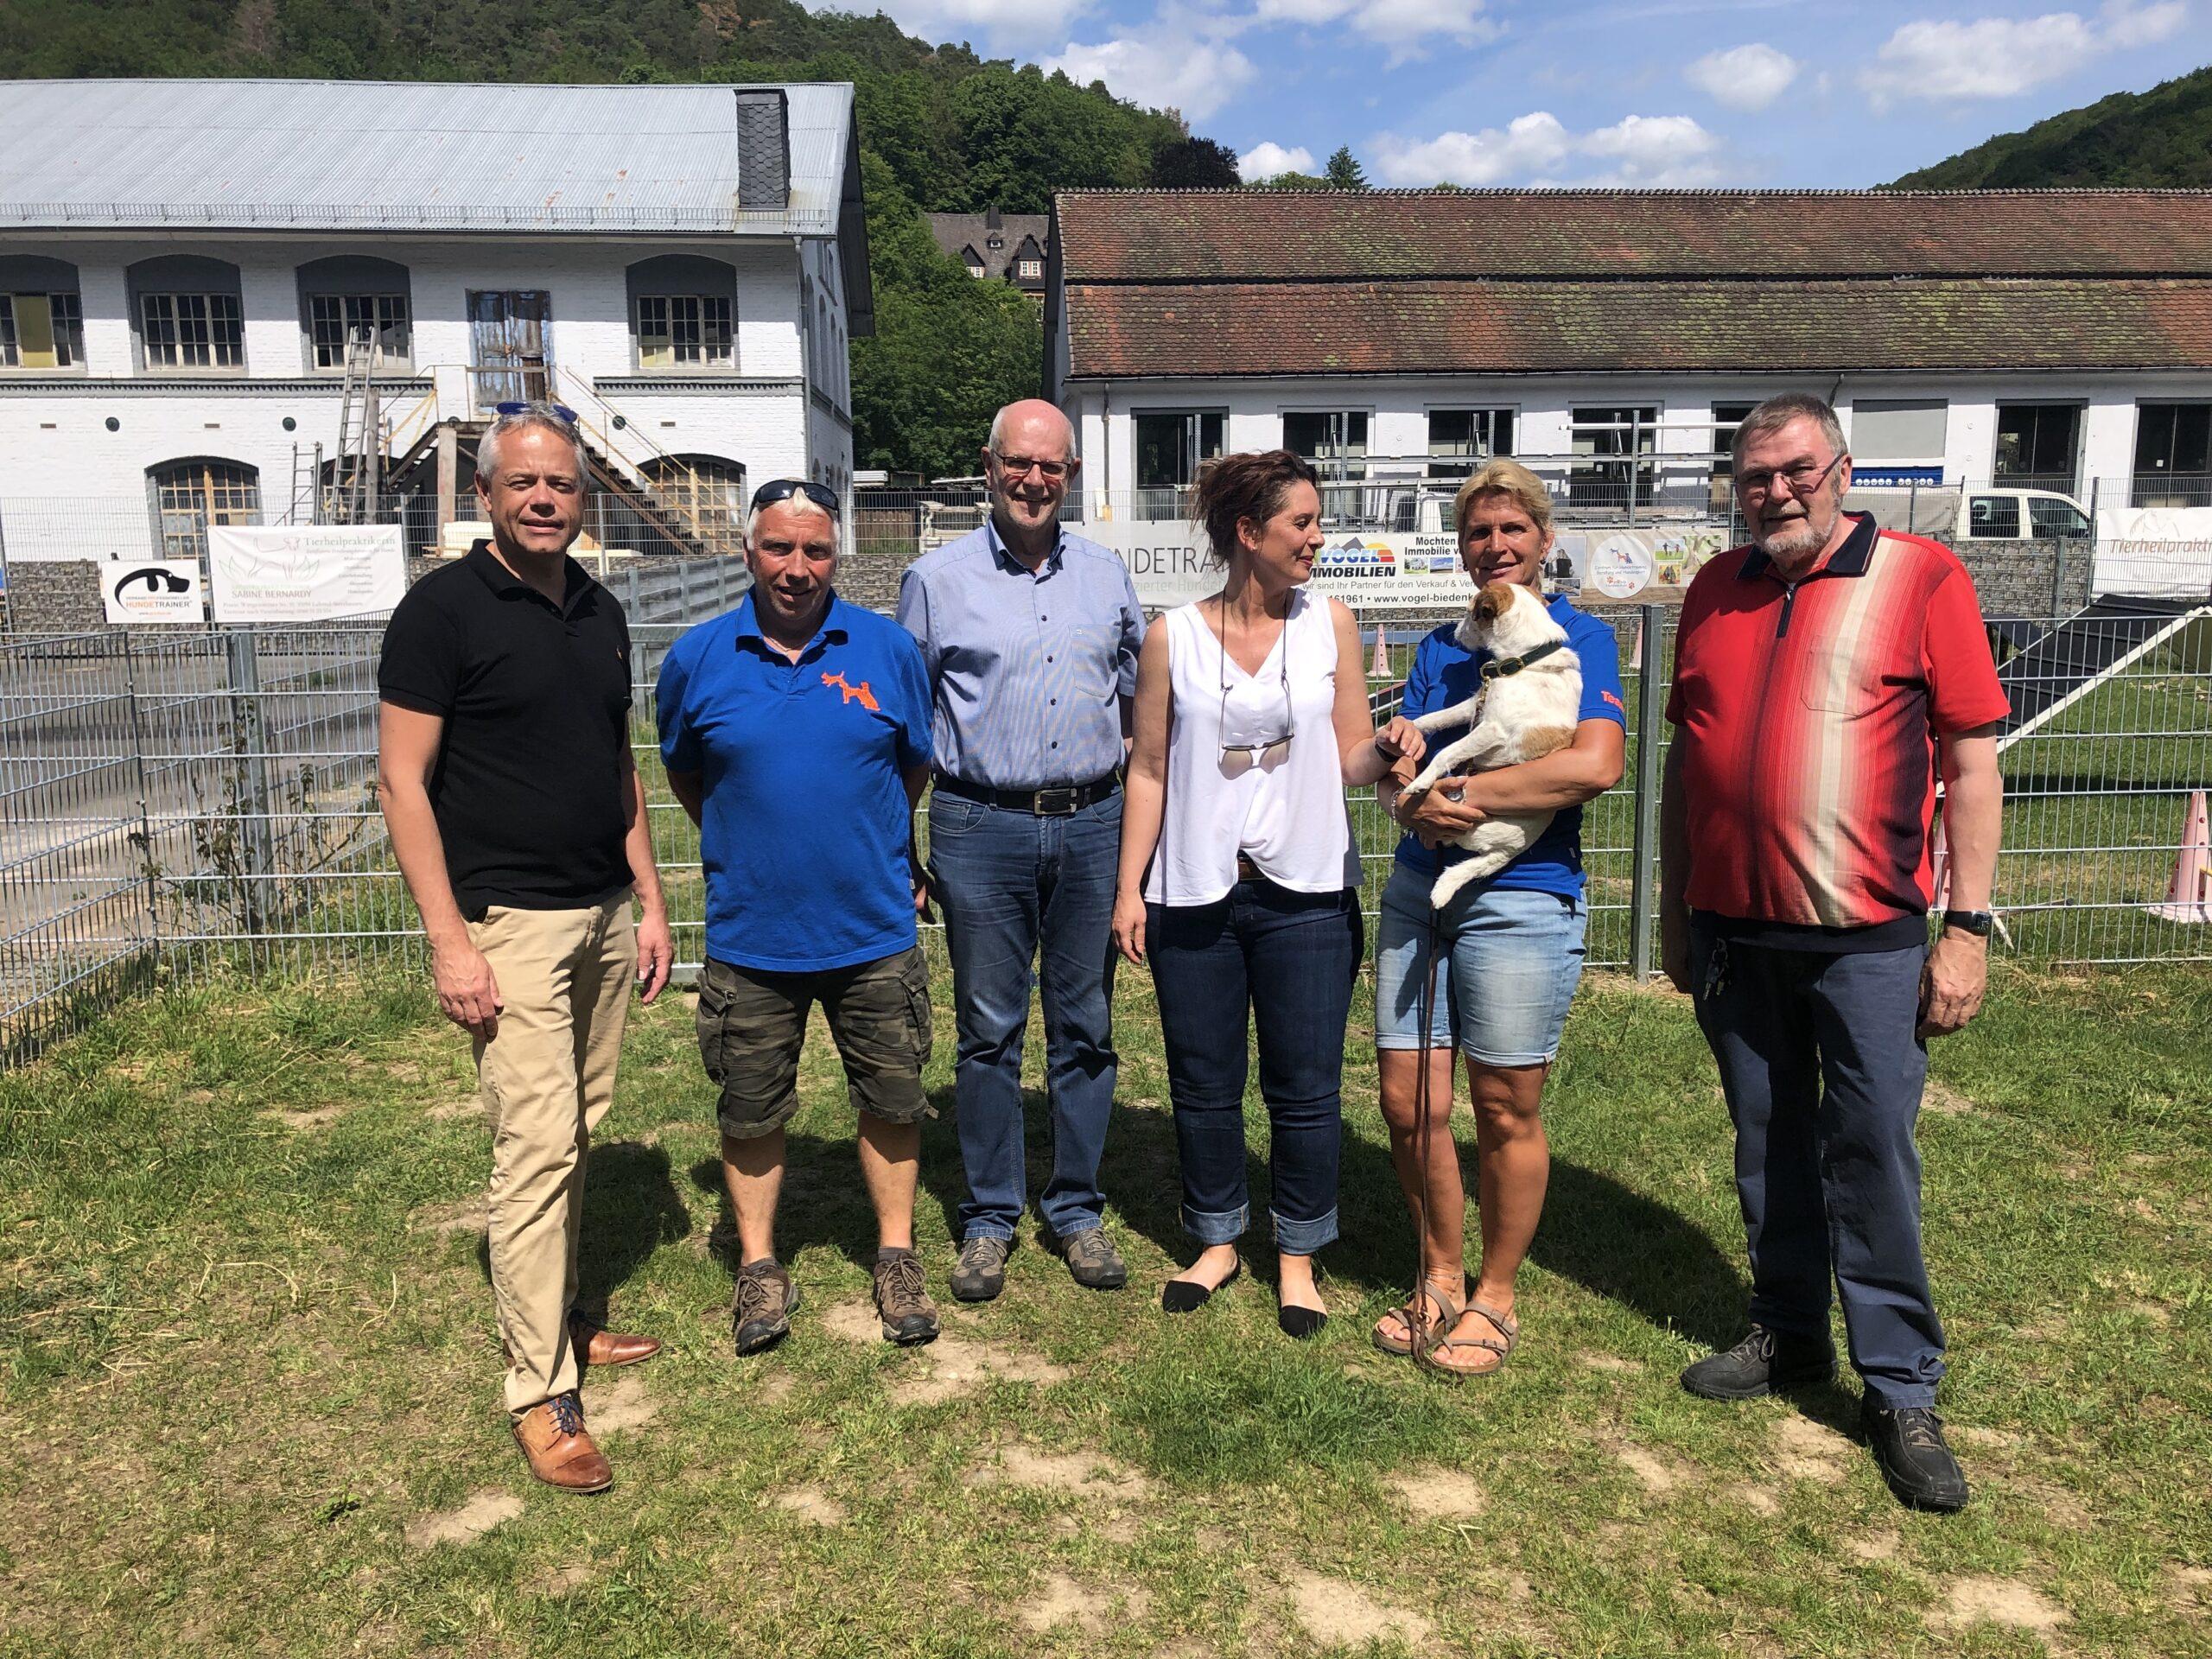 Besuch Uwe Pöppler mit CDU Fraktion